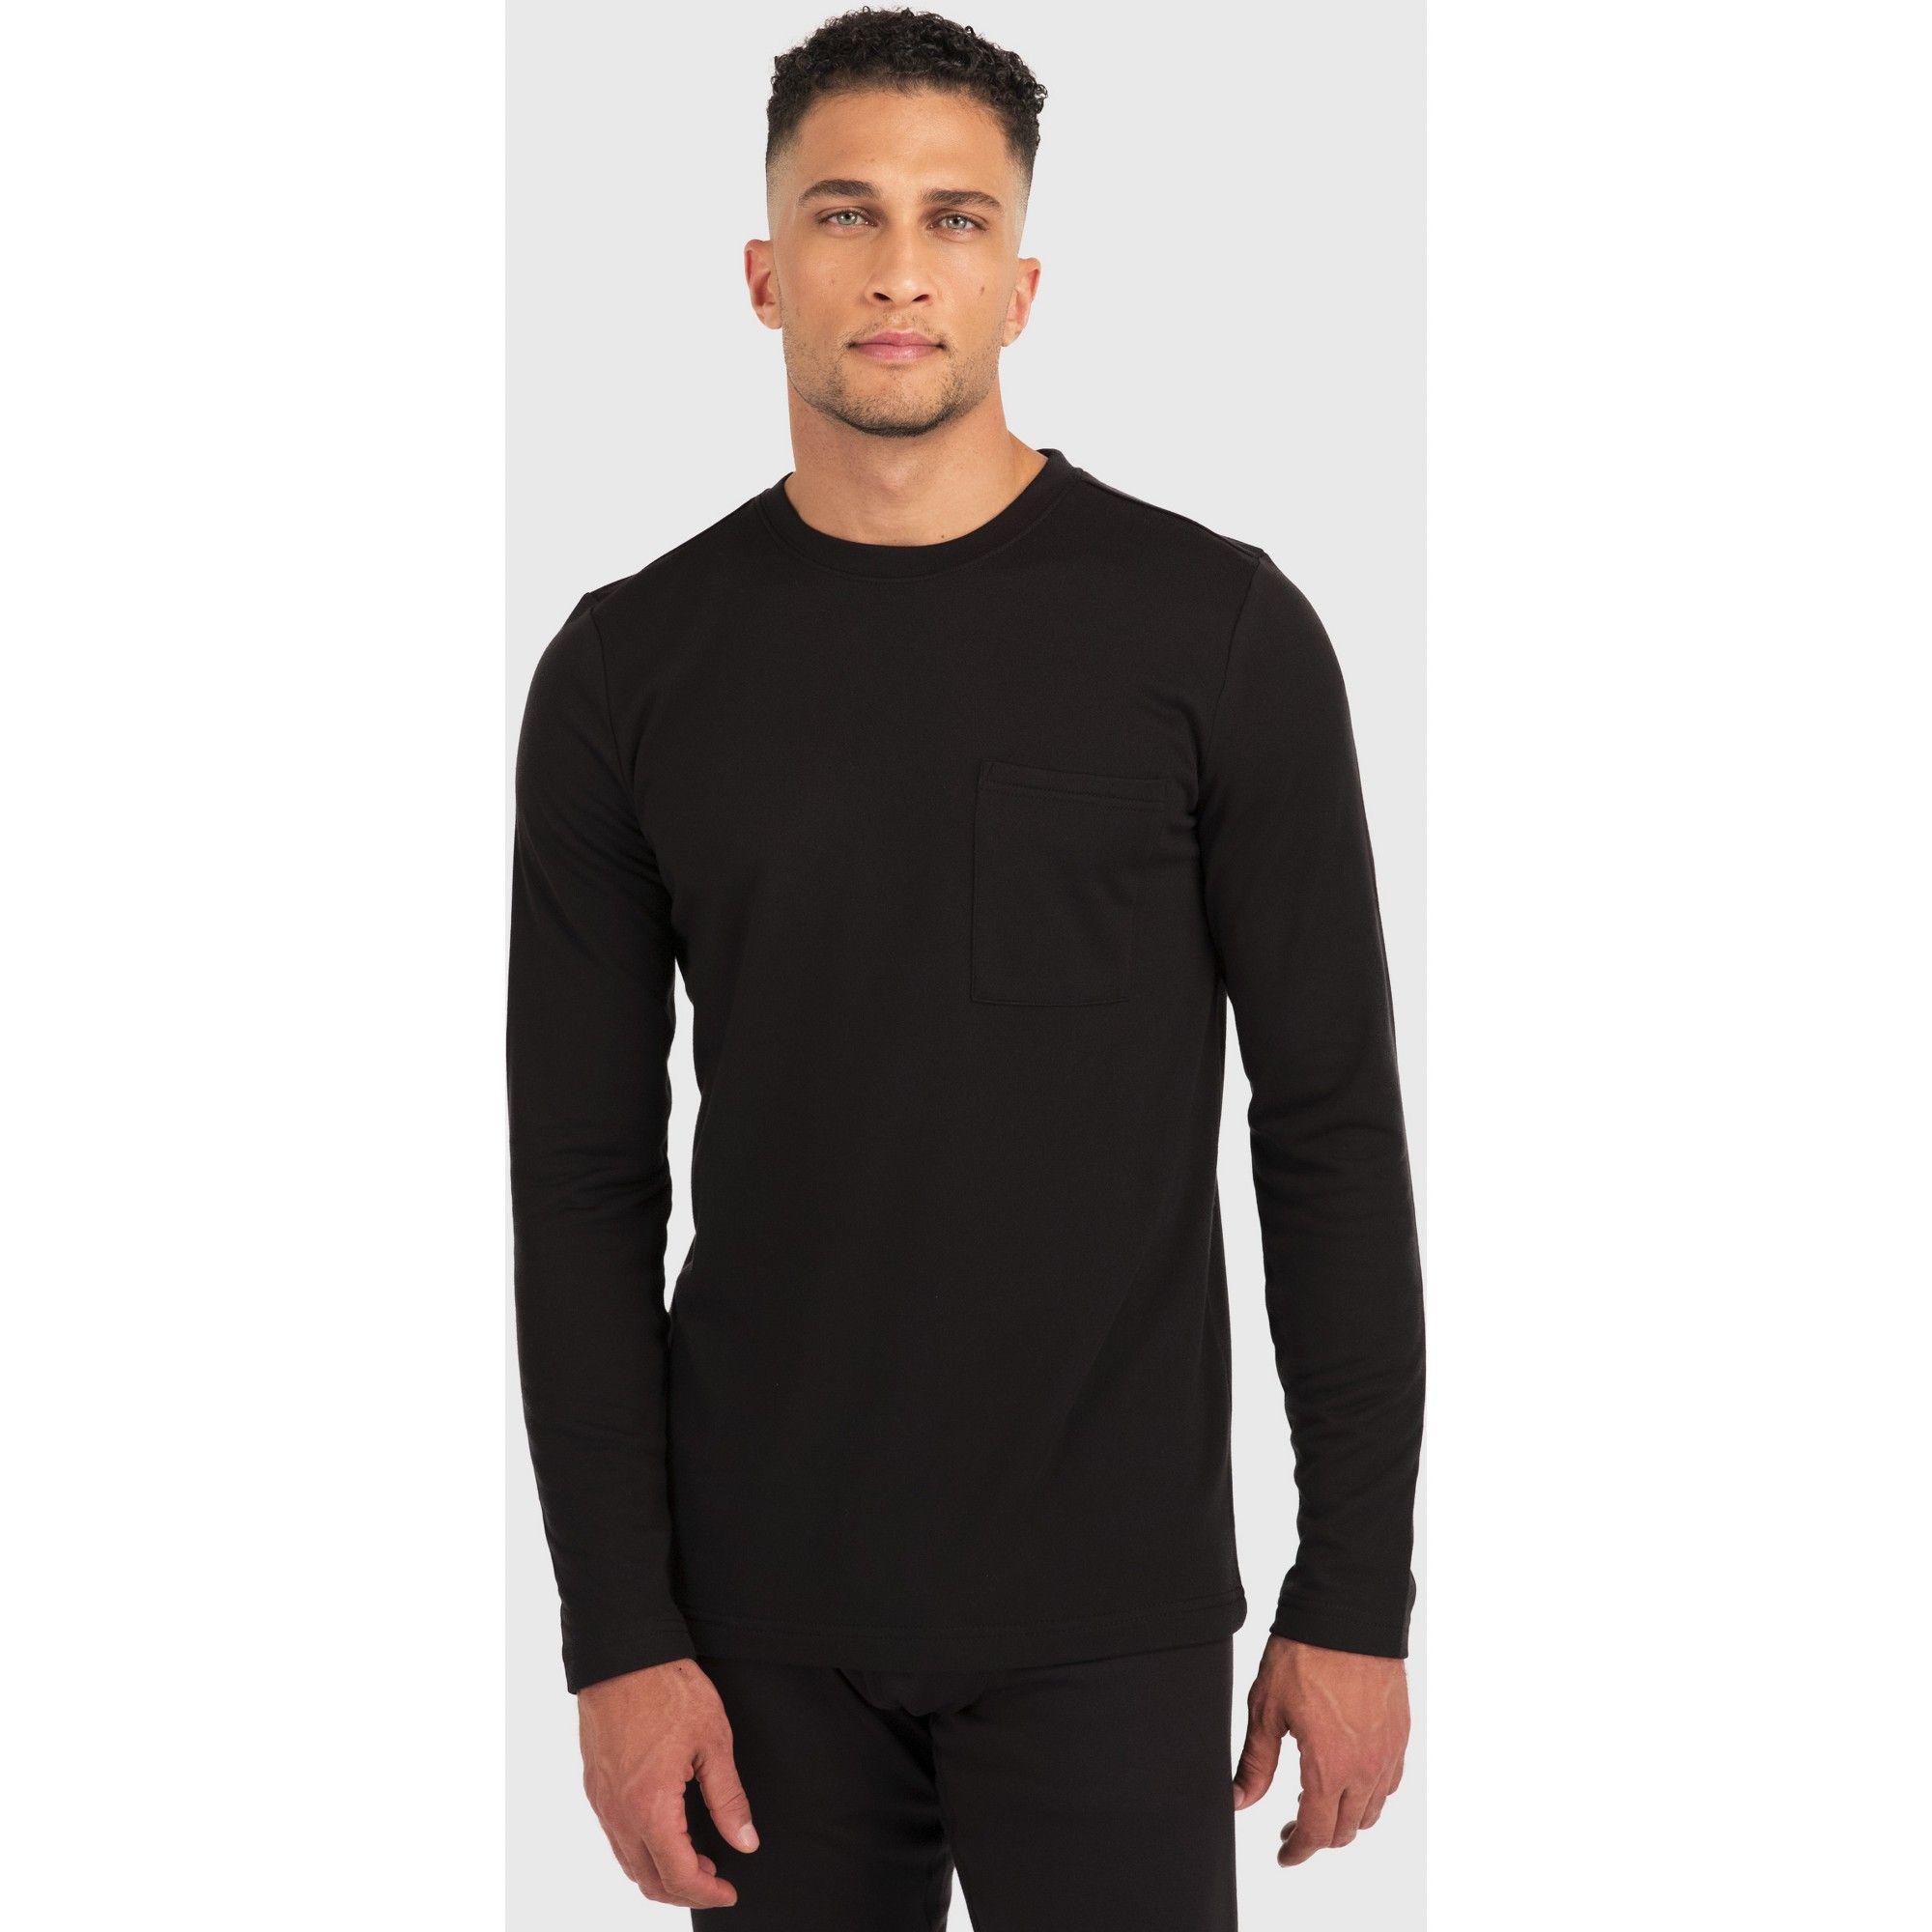 738c75fab6 Wander by Hottotties Women's Tunic - Gray XL   Products   Tunic, Tunic  tops, Soft fabrics